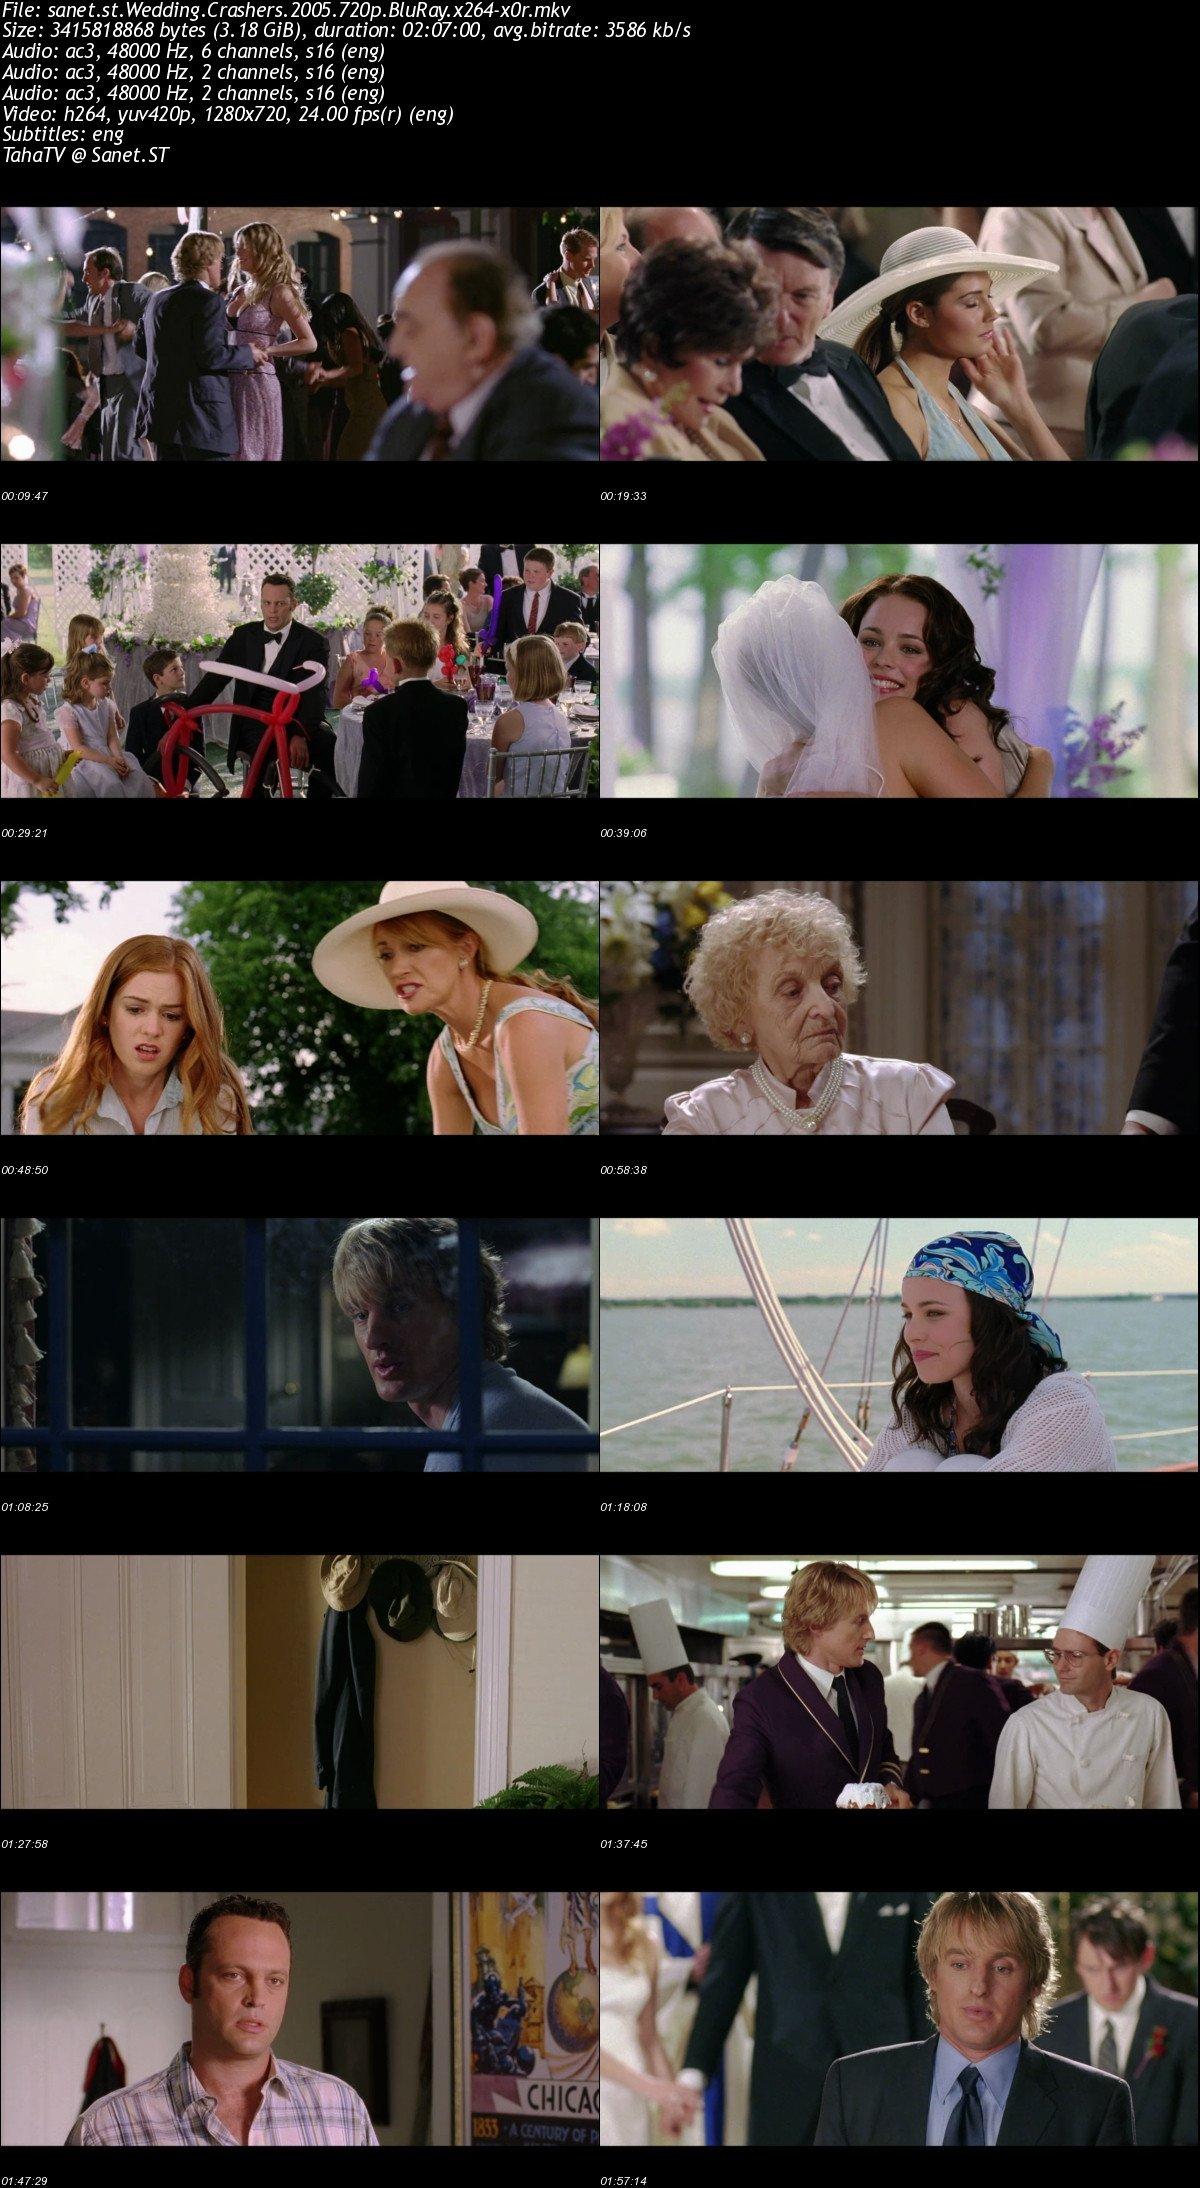 Download Wedding Crashers 2005 720p Bluray X264 X0r Softarchive